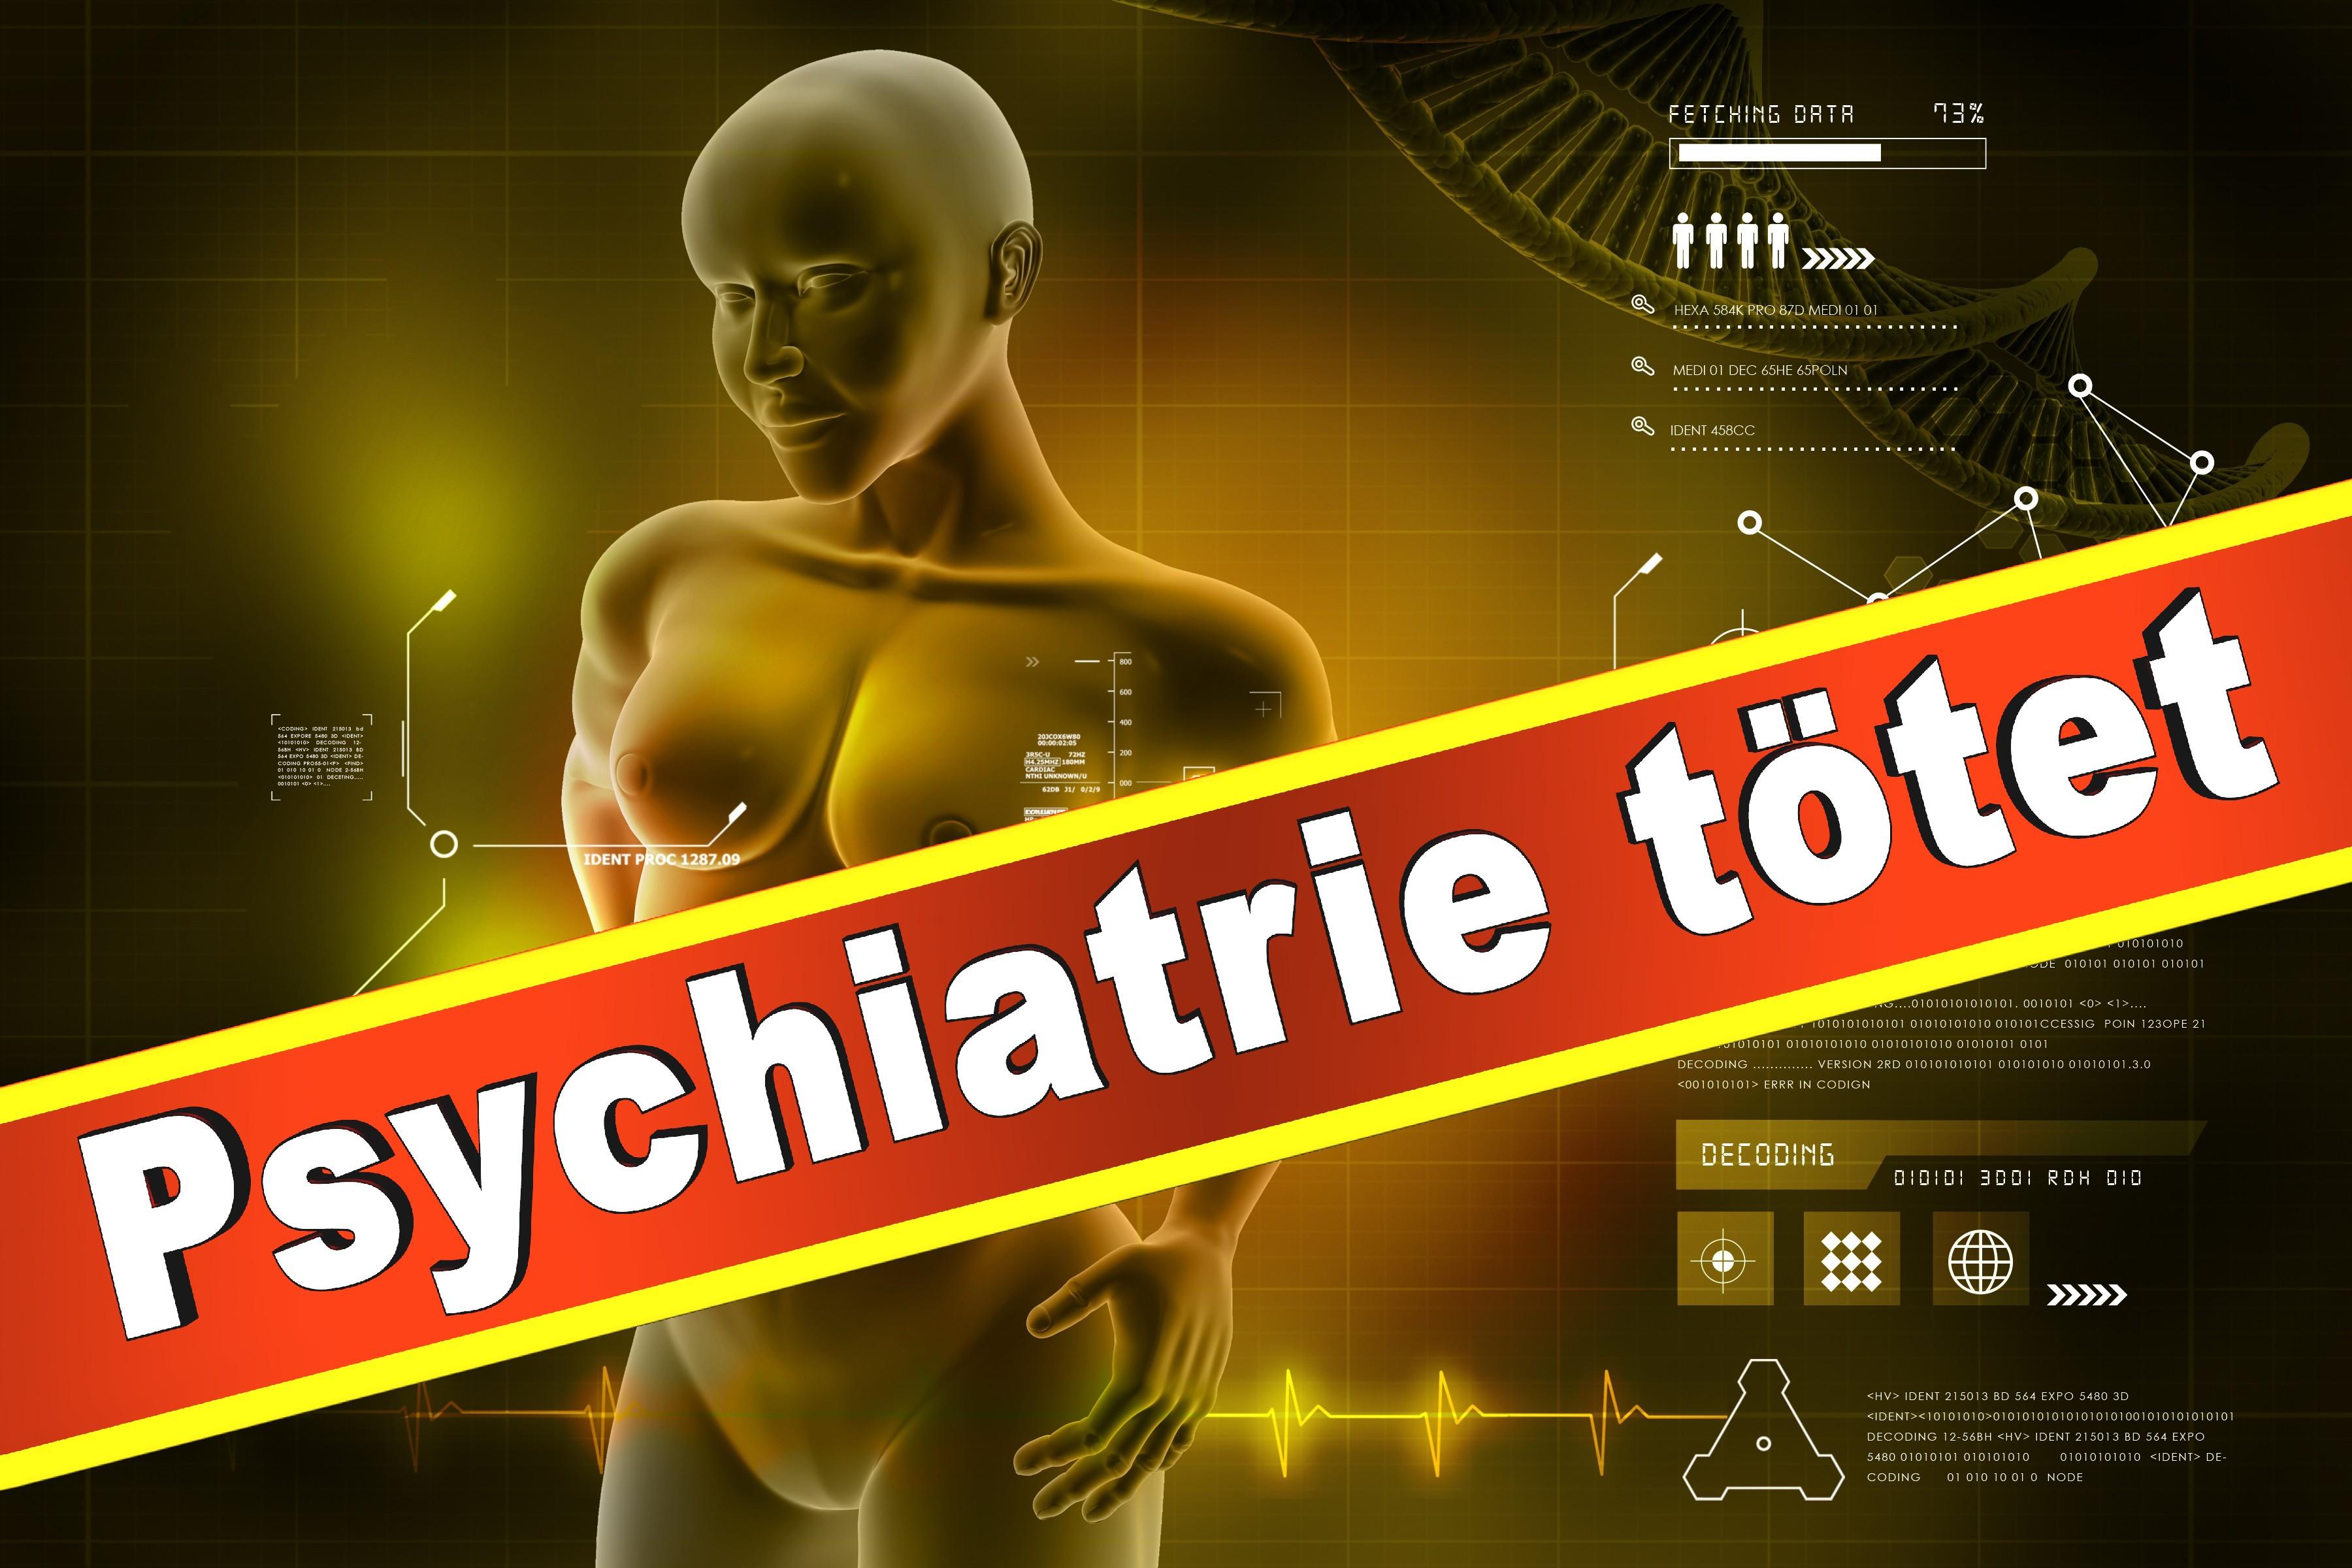 Herr Dr Med Wolf Dieter Michaelis Arzt Hannover Gutachten Psychiater Facharzt Psychiatrie